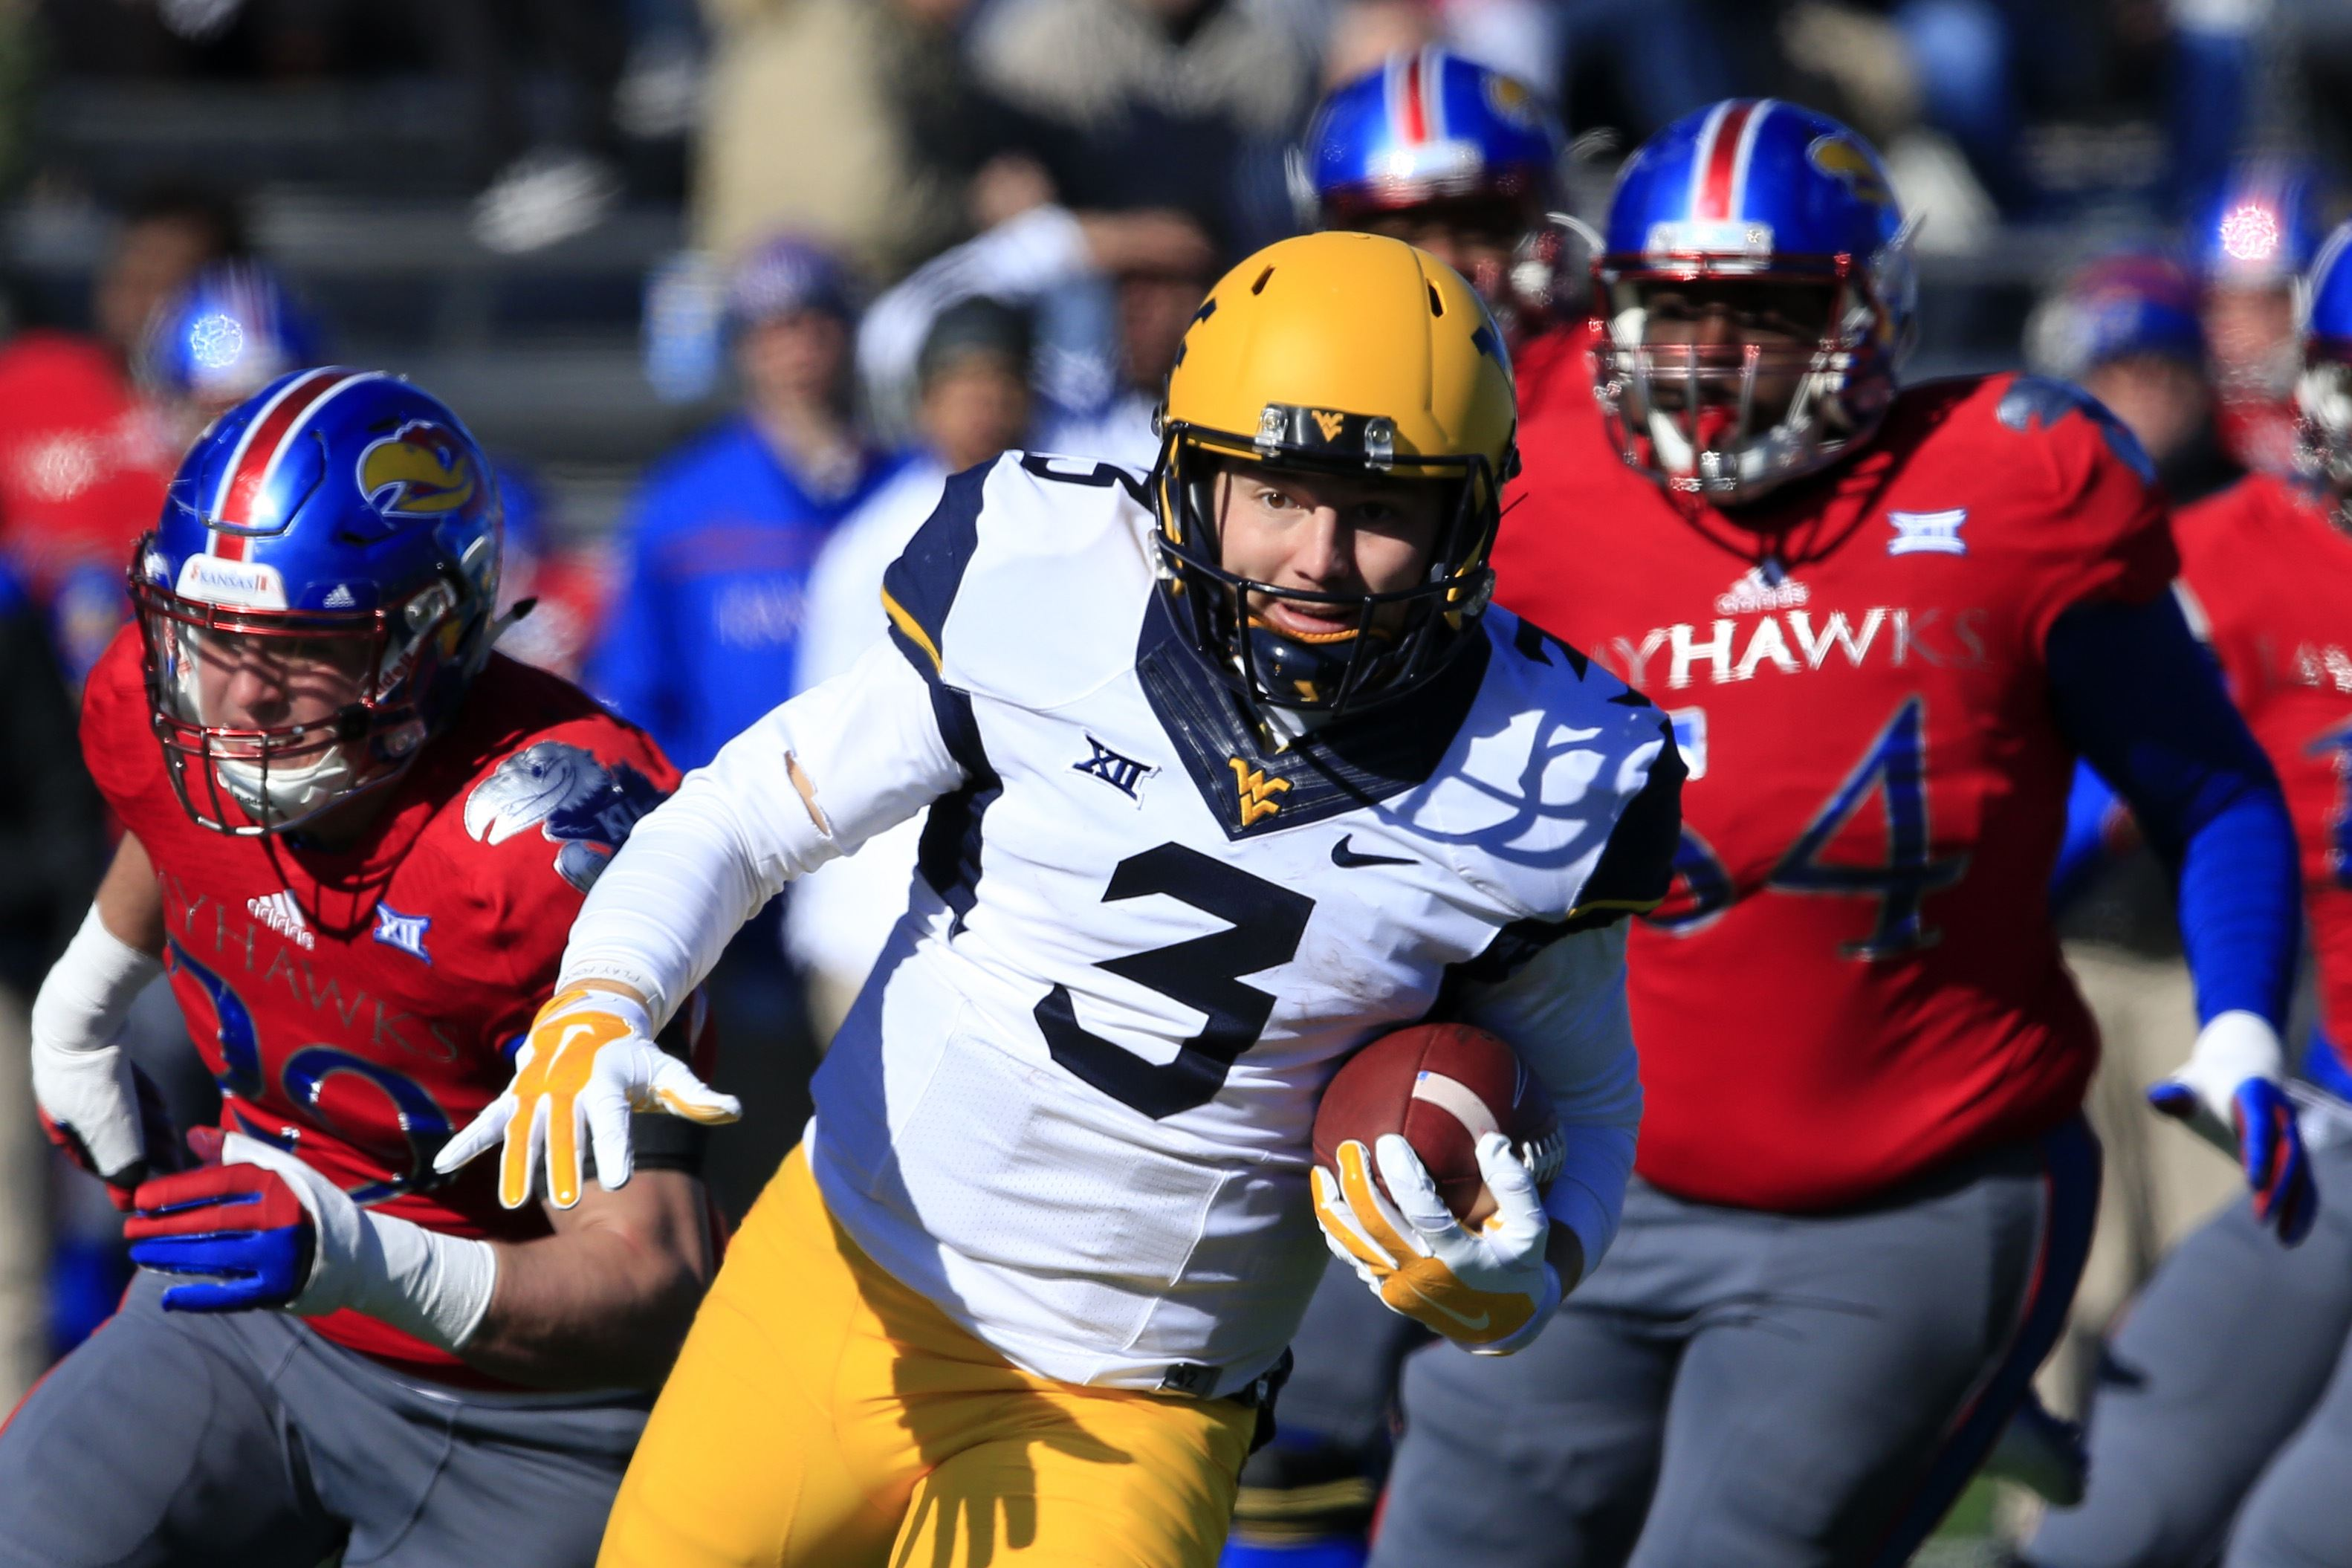 http://www.post-gazette.com/image/2015/11/21/ca0,0,3165,2110/West-Virginia-Kansas-Football-1.jpg